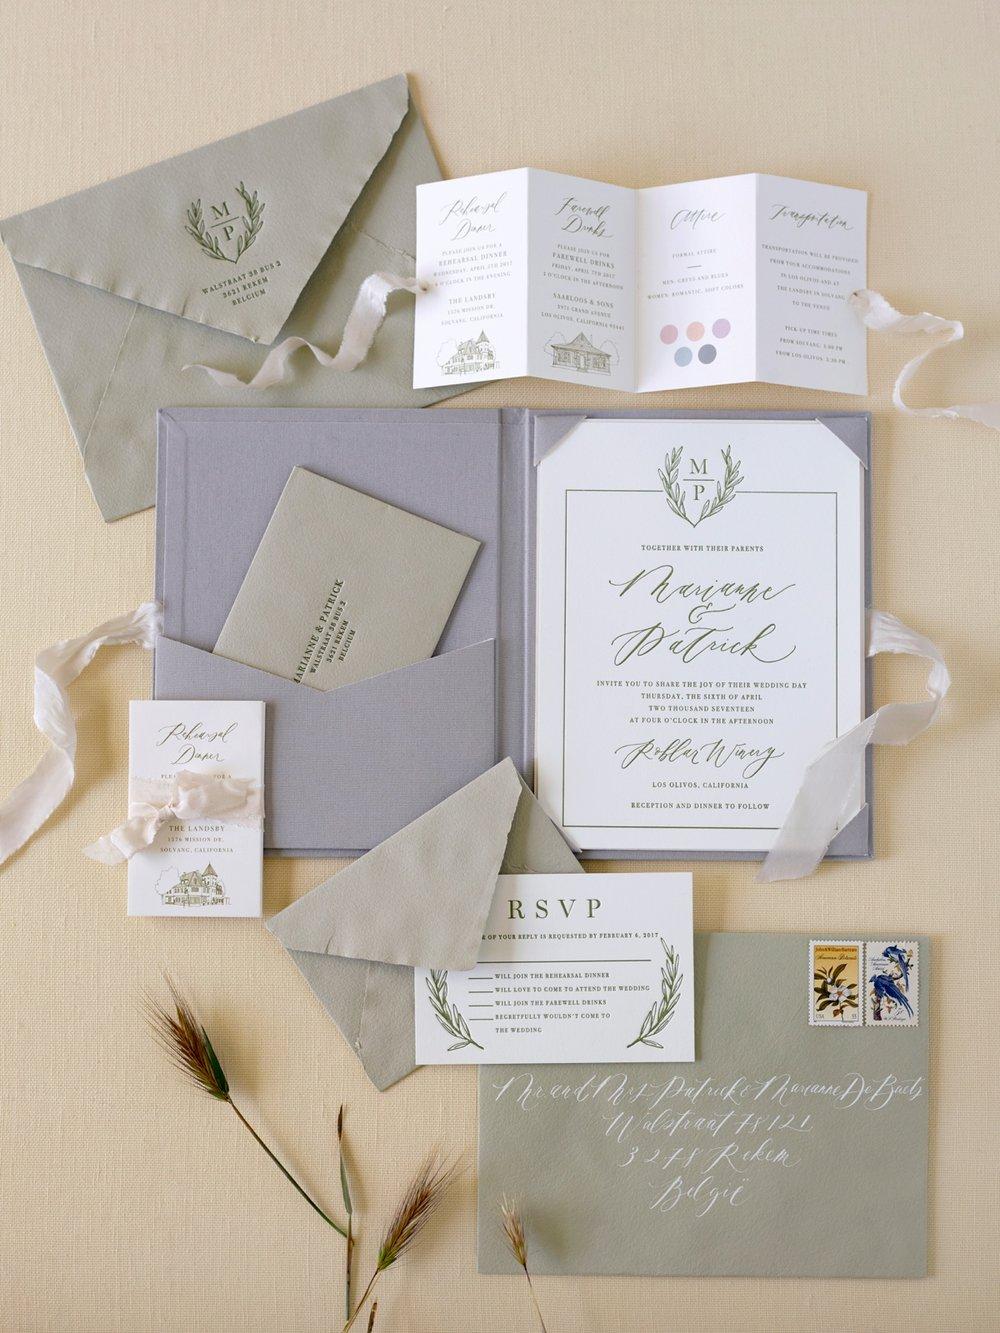 02_written-word-calligraphy-wedding-invitation.jpg